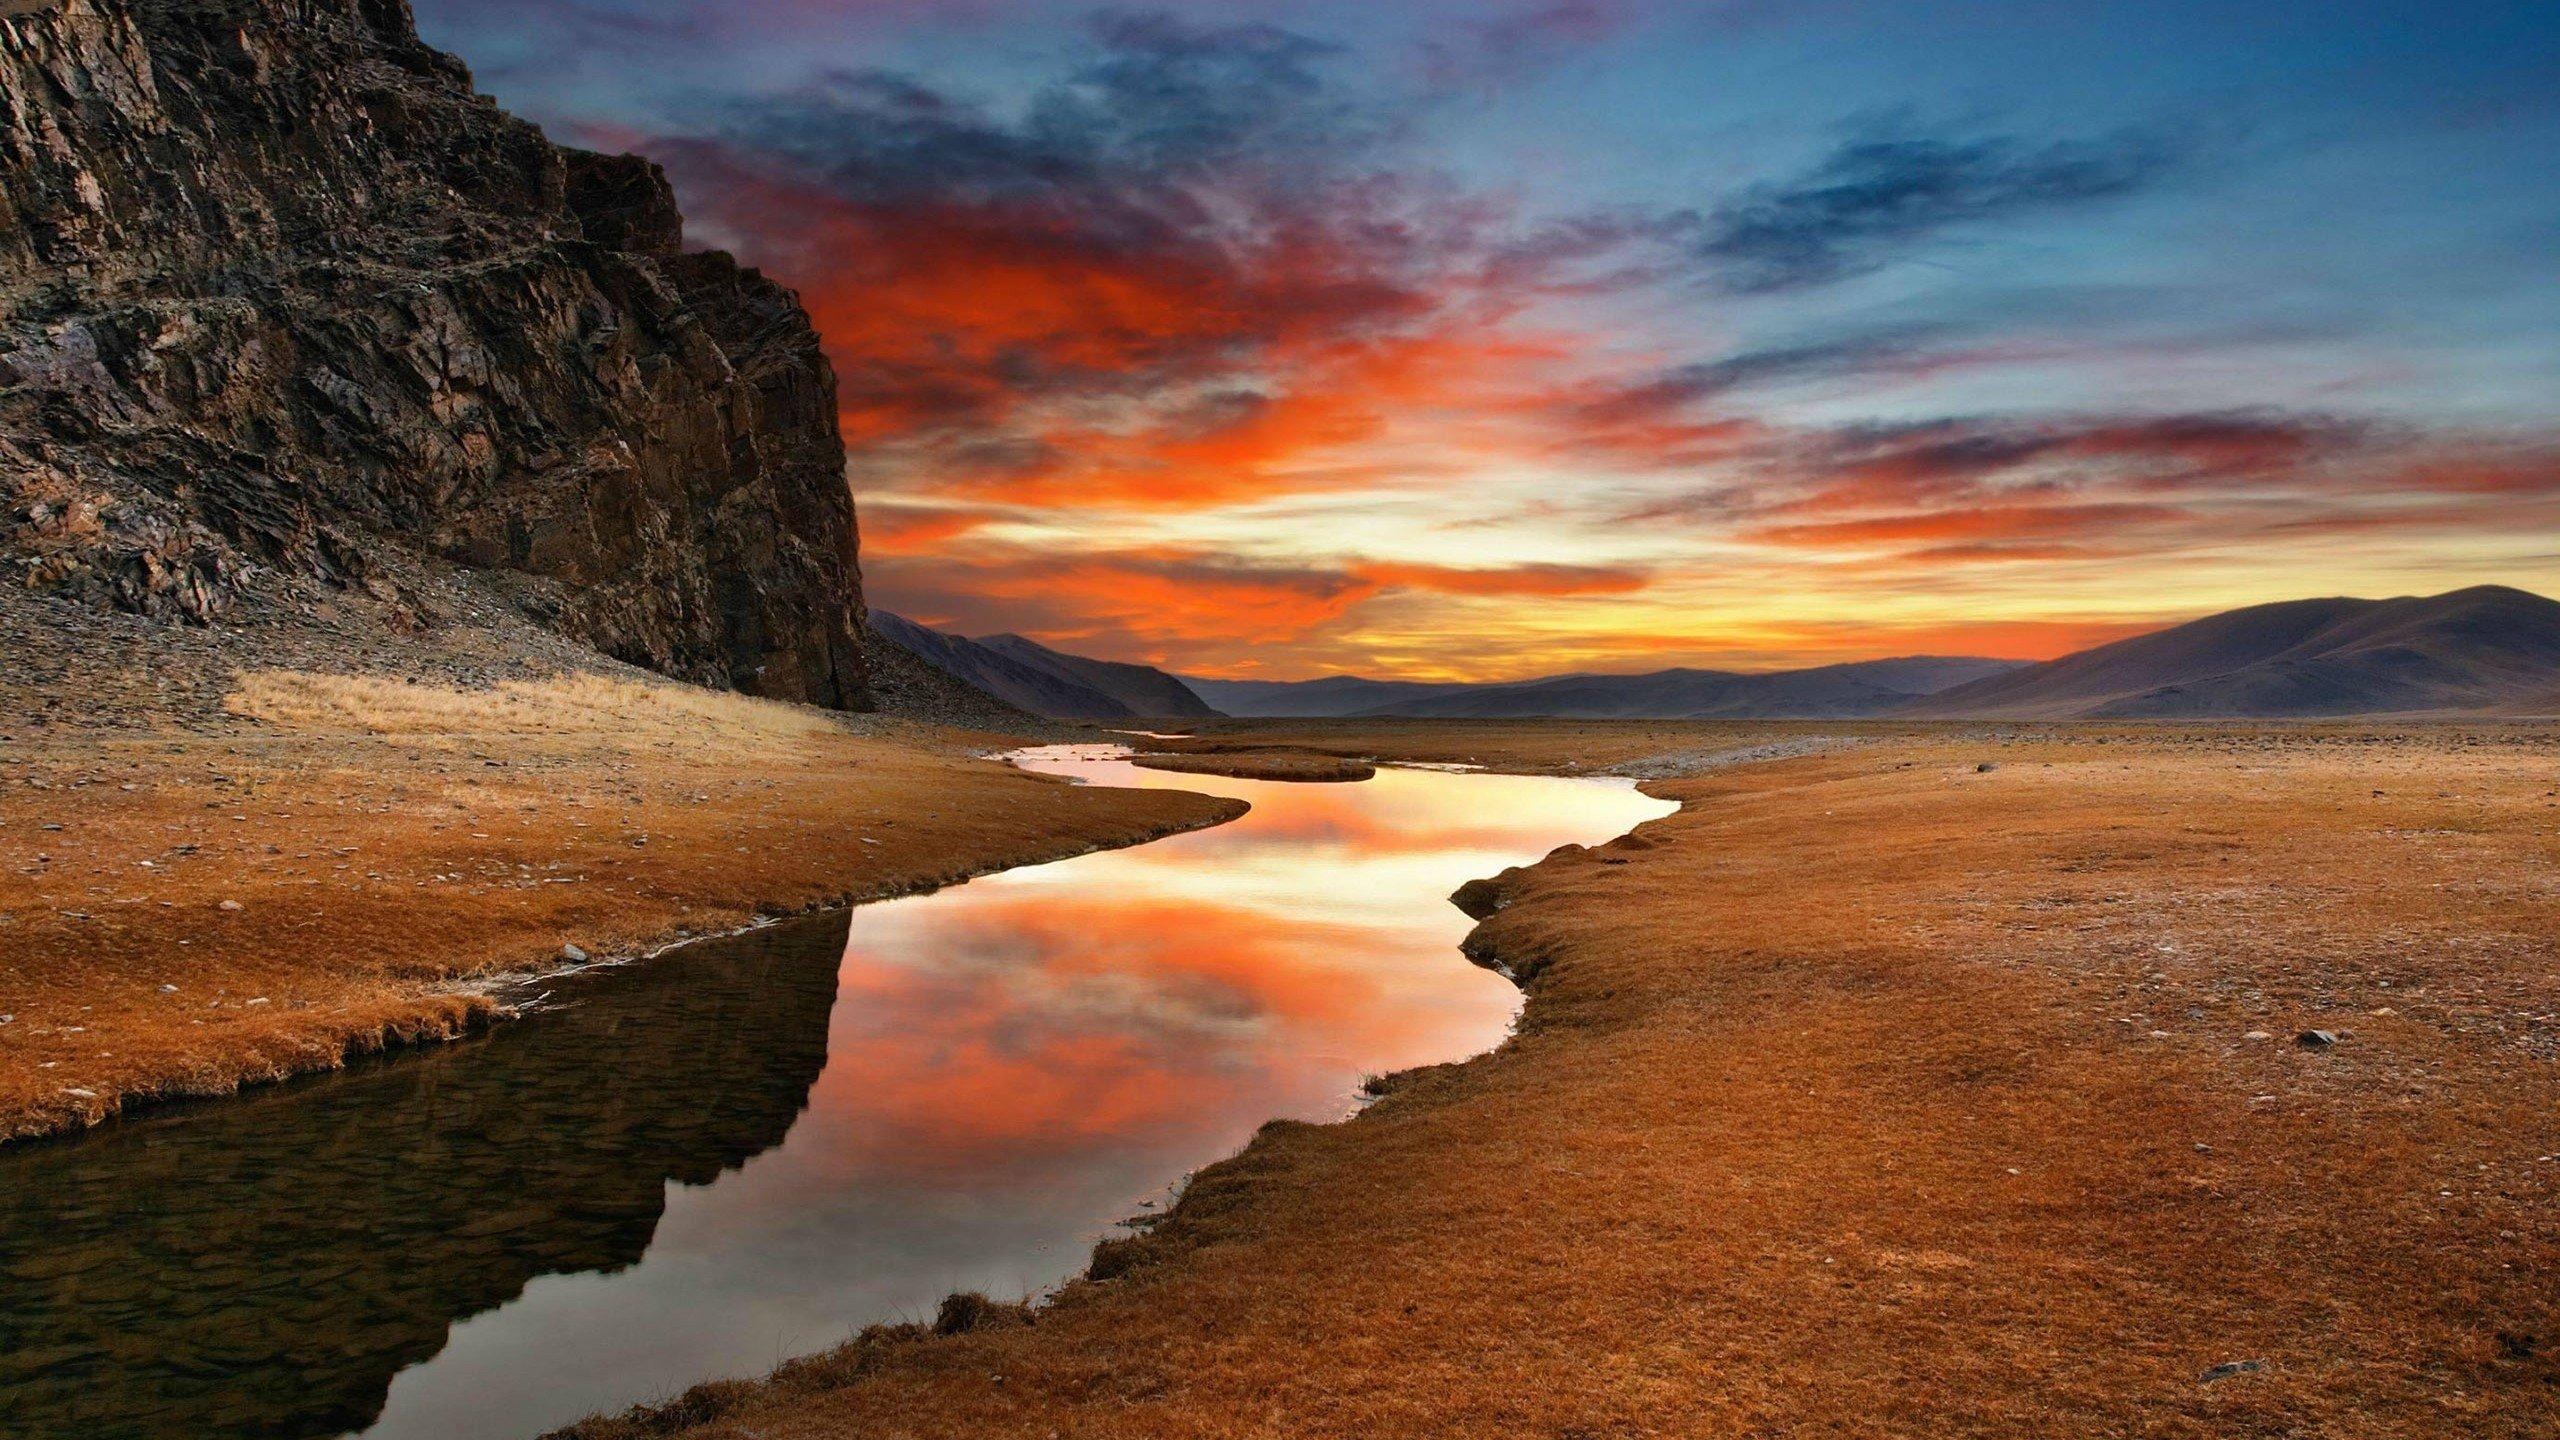 mountain nature landscape cloud lake tree reflection river rock hd 4k 2560x1440